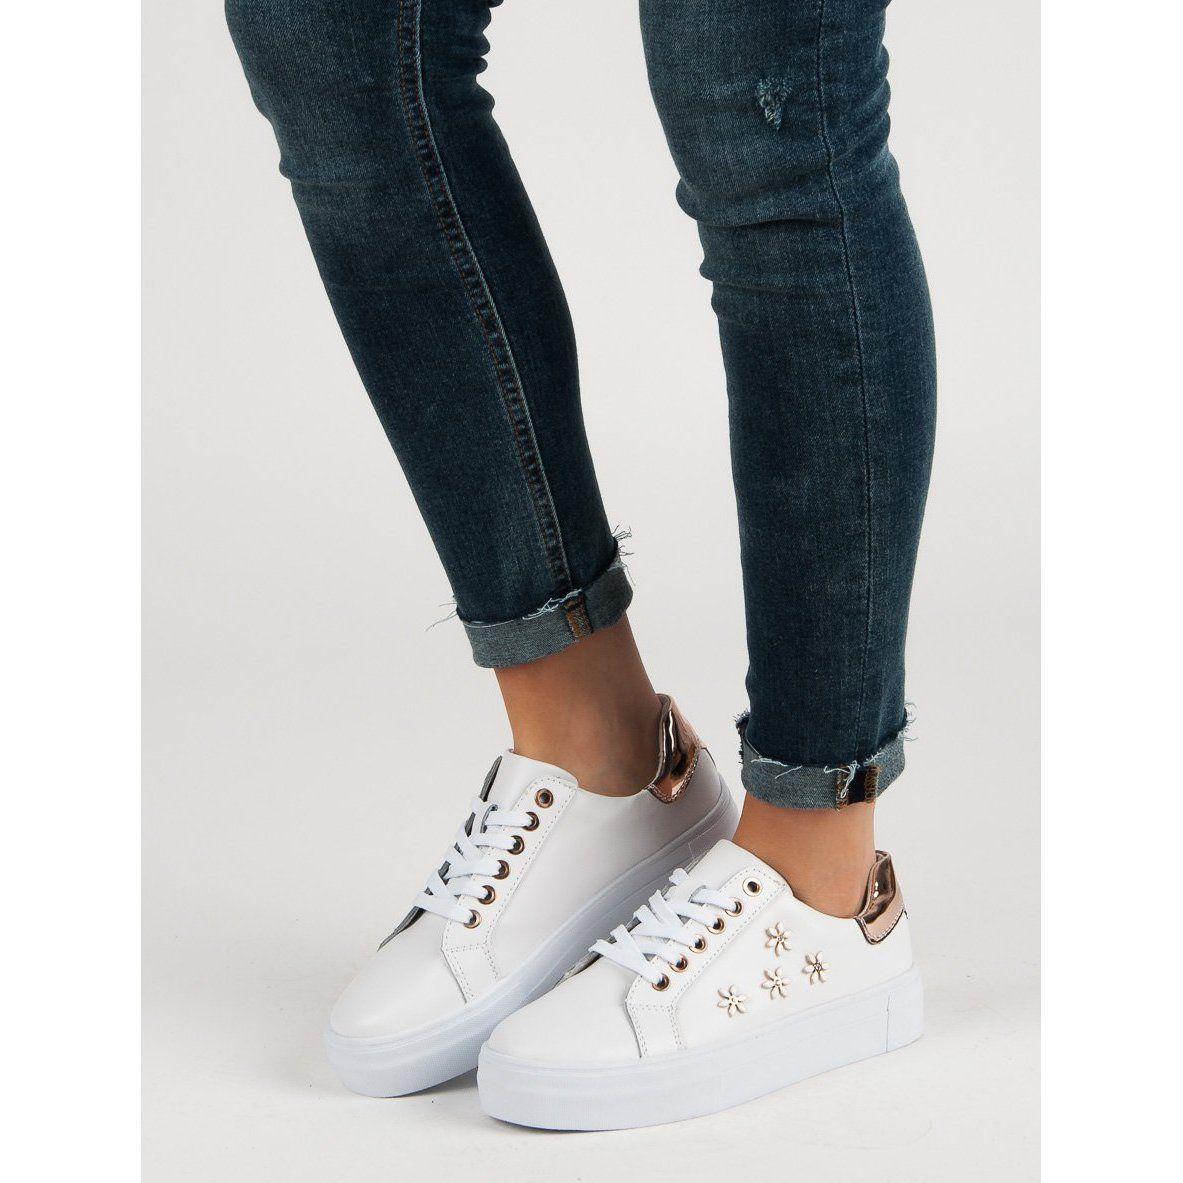 Filippo Skorzane Buty Sportowe Z Kwiatkami Biale Shoes White Sneaker Fashion